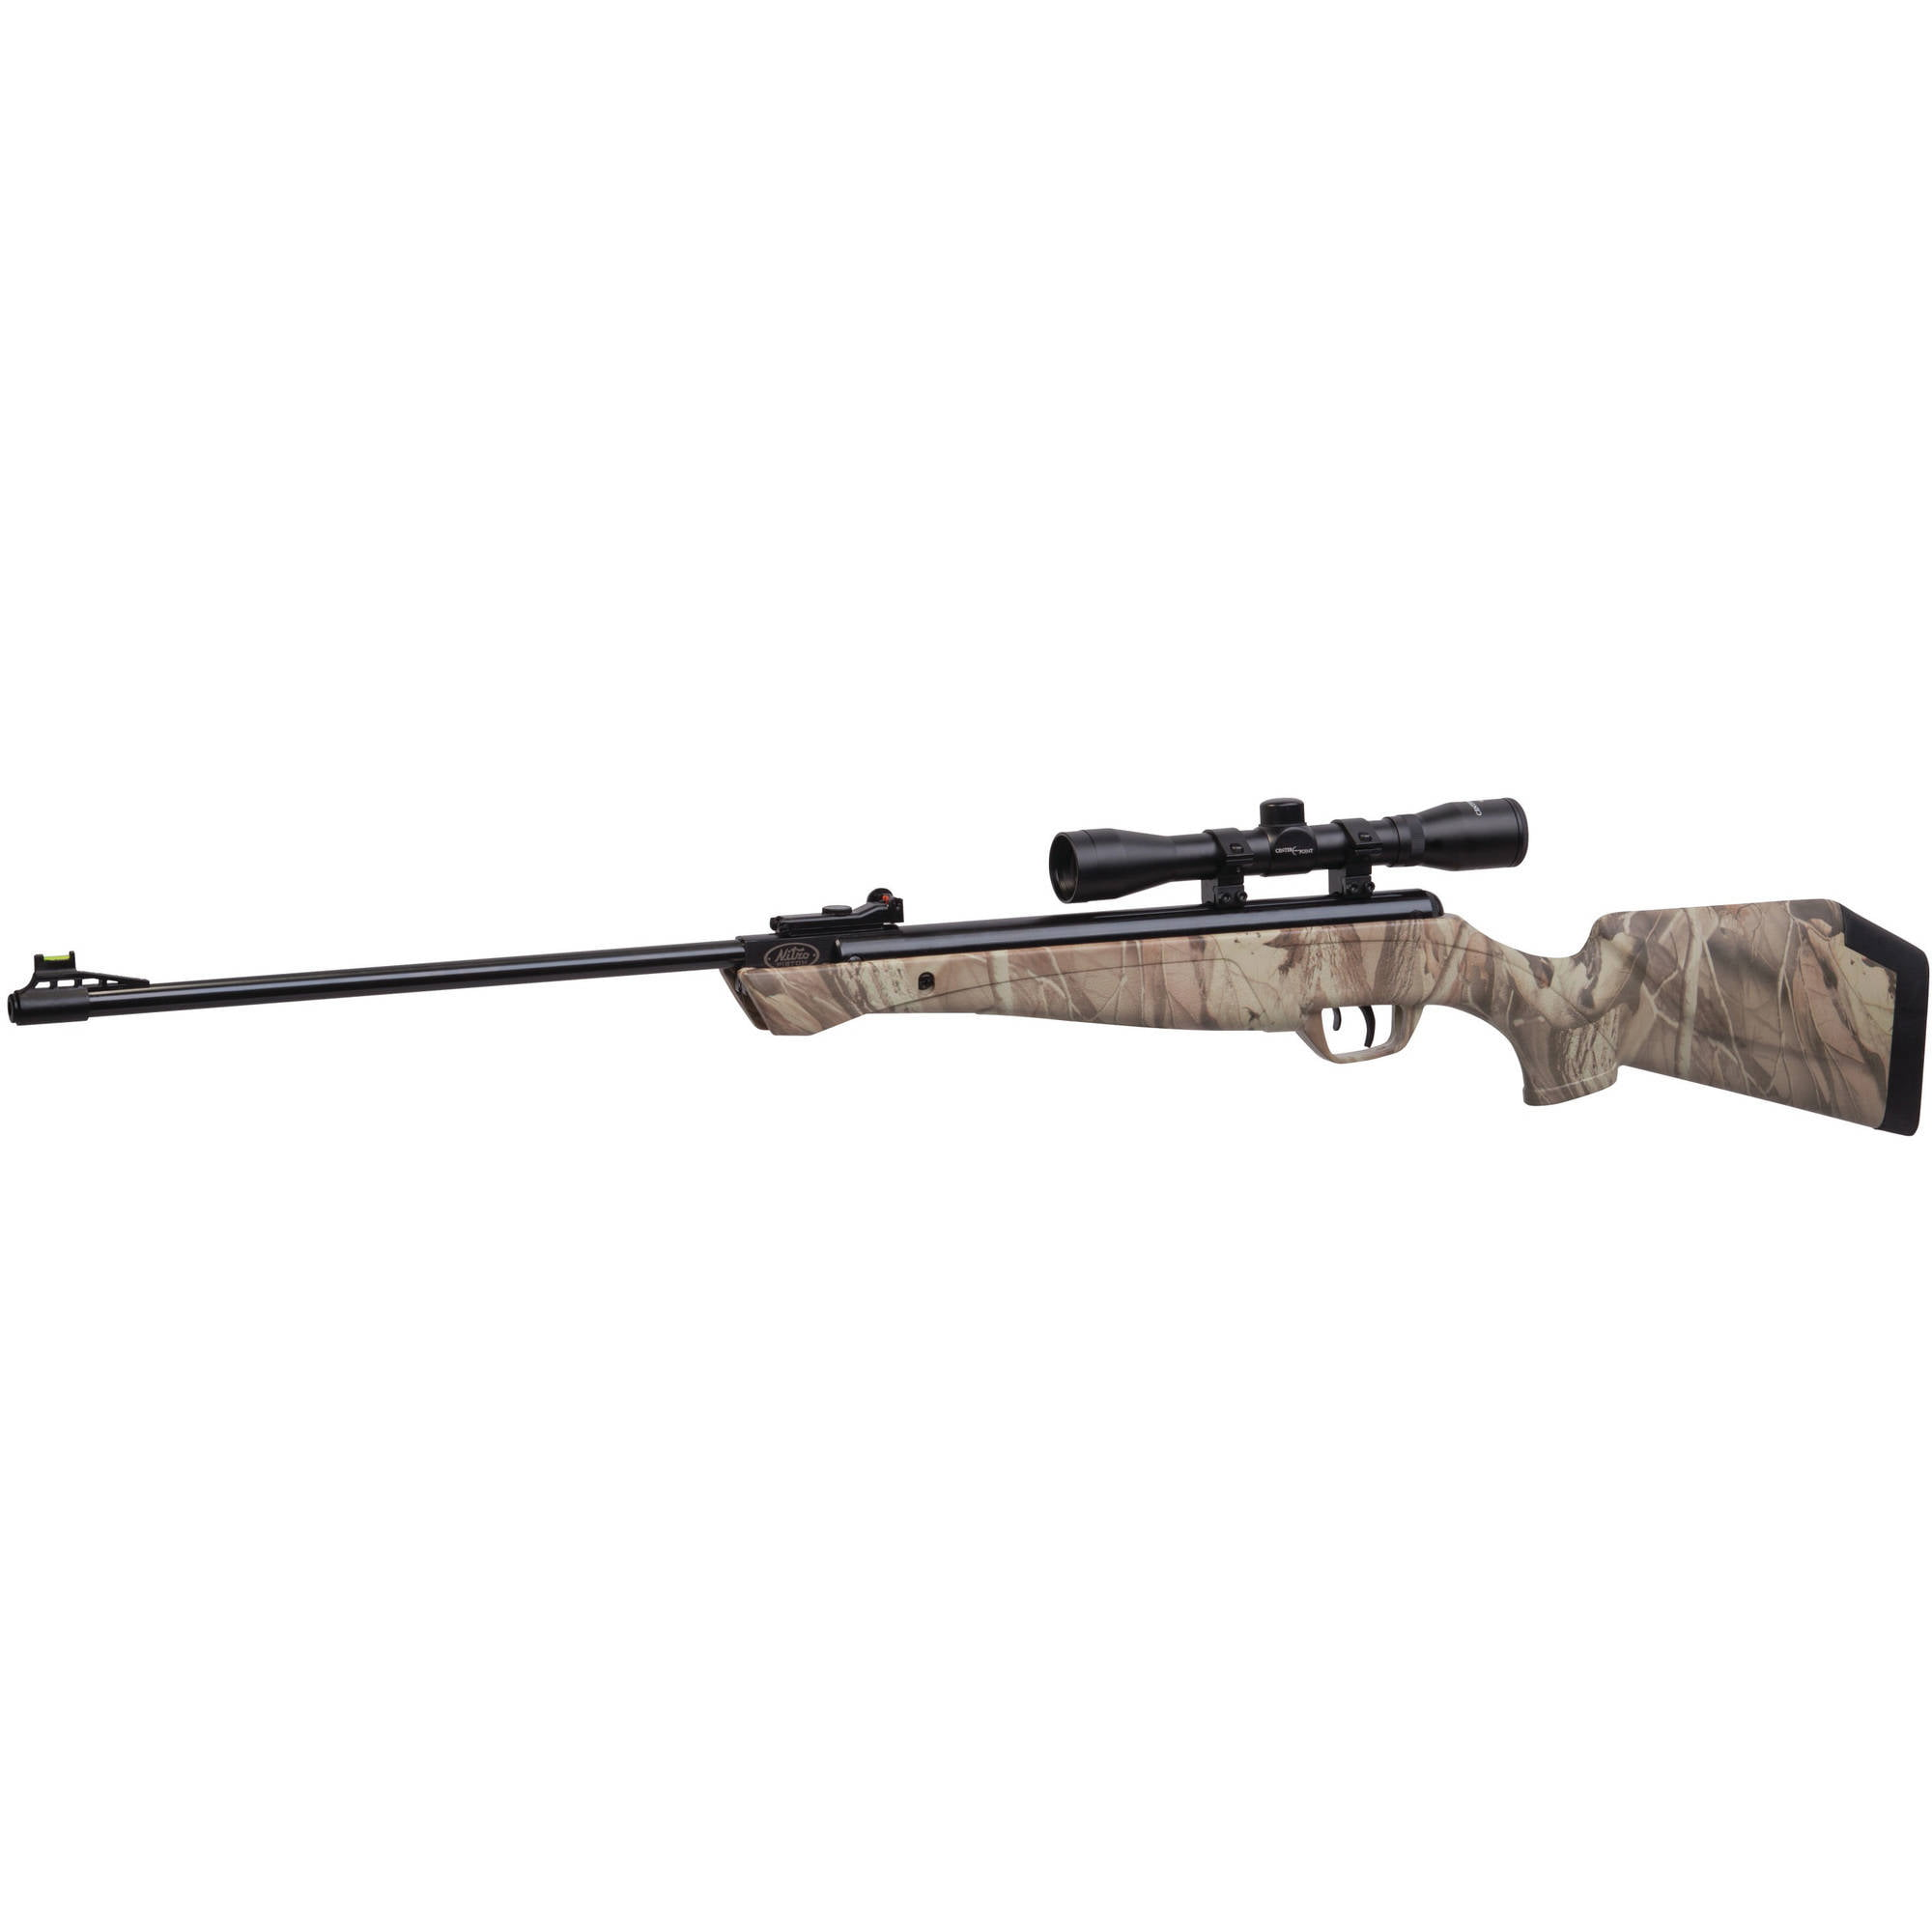 Click here to buy Crosman Phantom Hunter Camo NP .177 Caliber Break Barrel Air Rifle with Scope, 1200fps by Crosman.